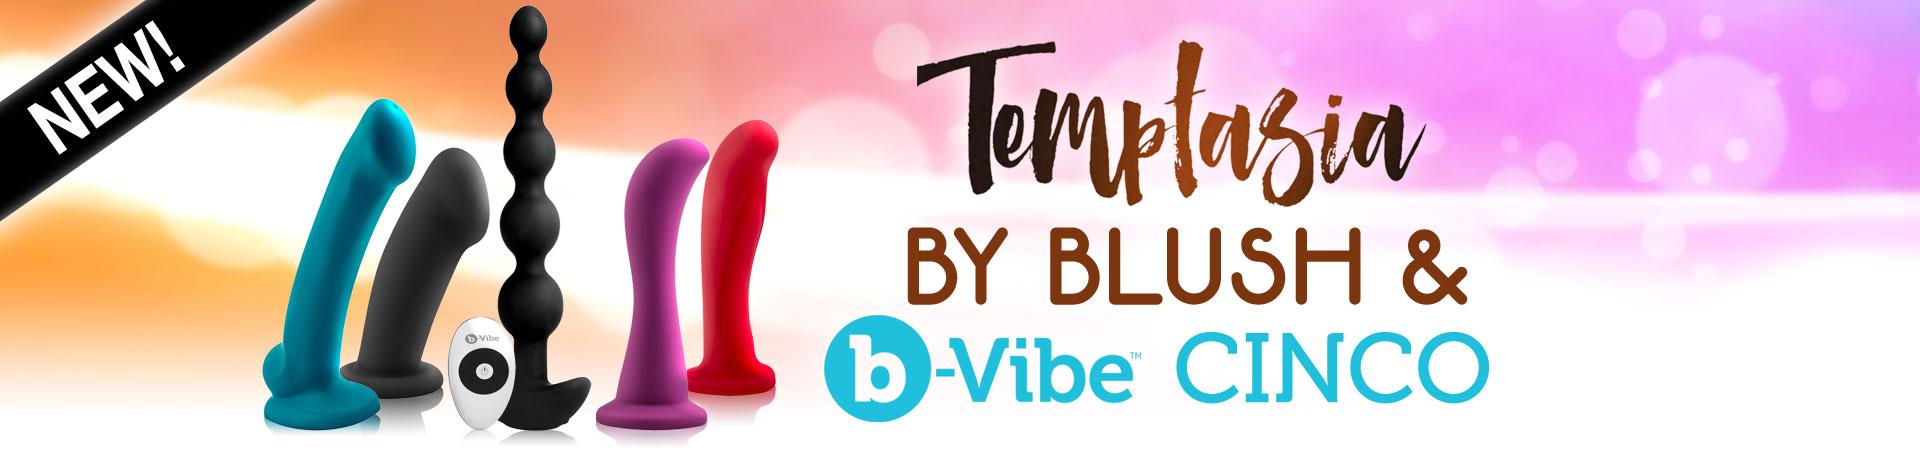 New At Shevibe! Temptasia By Blush & b-Vibe Cinco